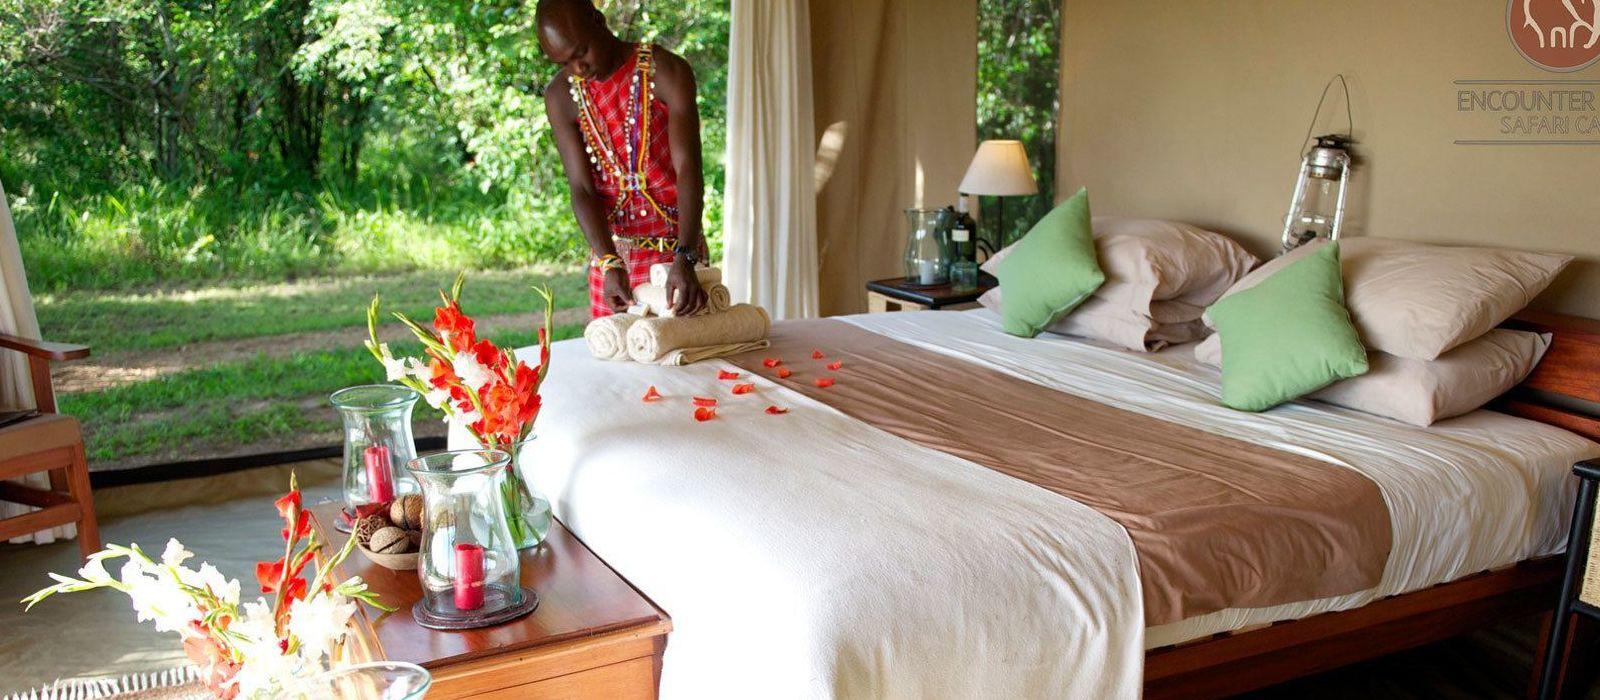 Hotel Encounter Mara Kenya